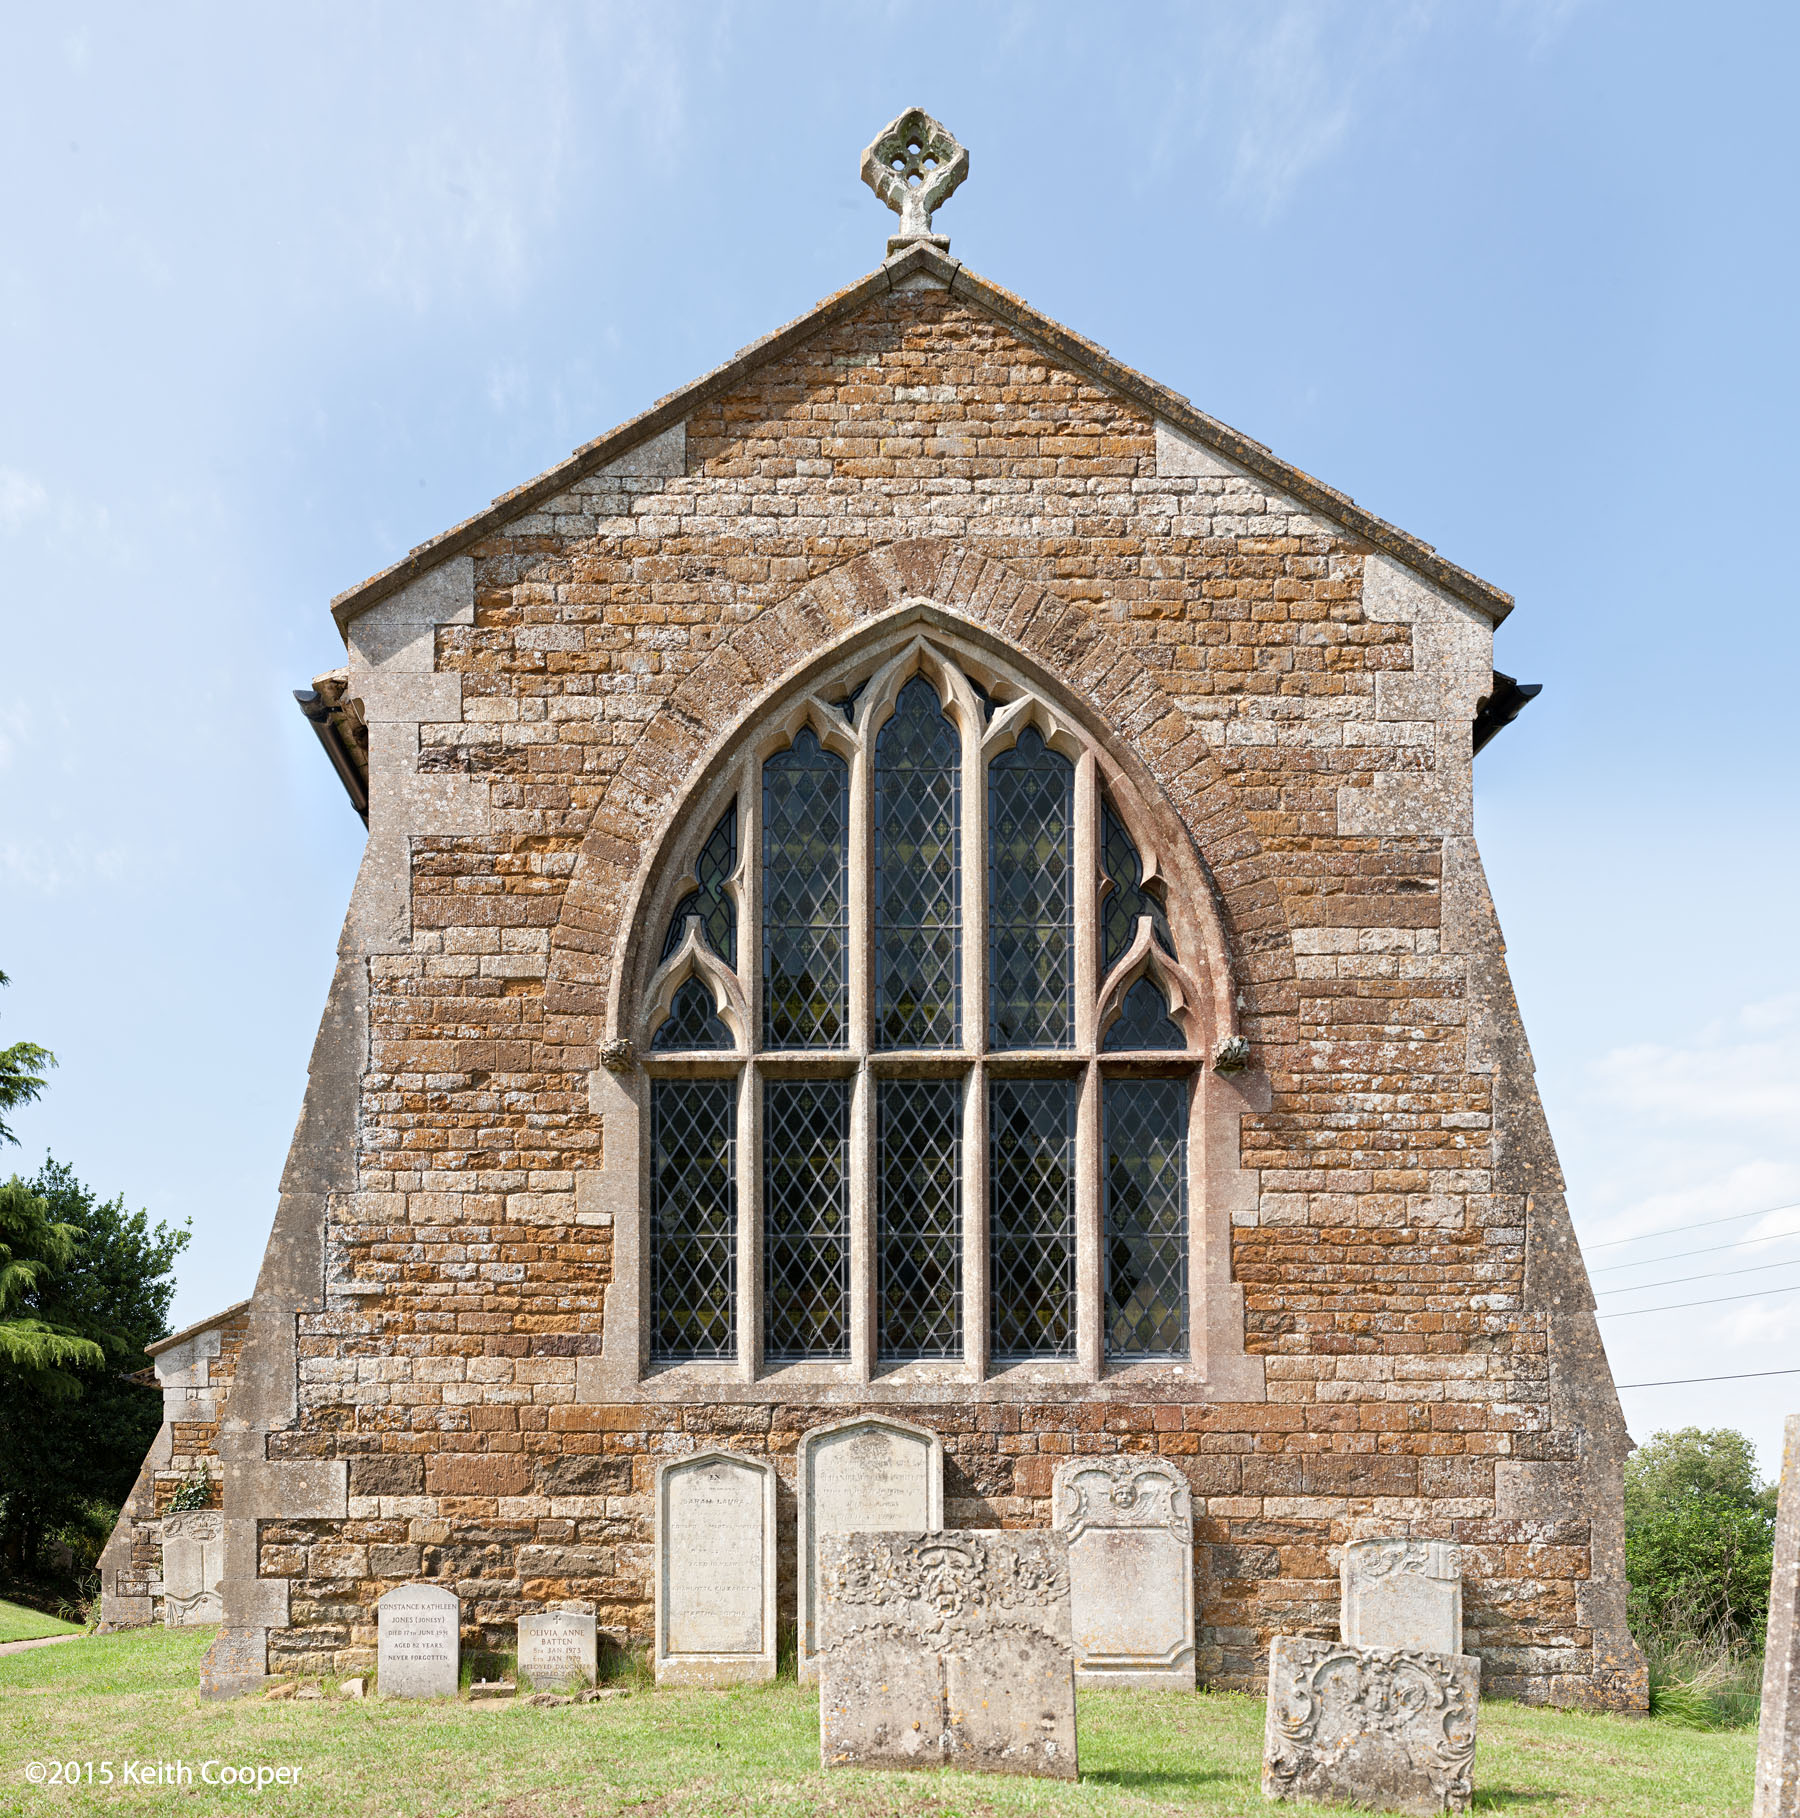 St Mary Magdalene and St Andrew's Church, Ridlington, Rutland